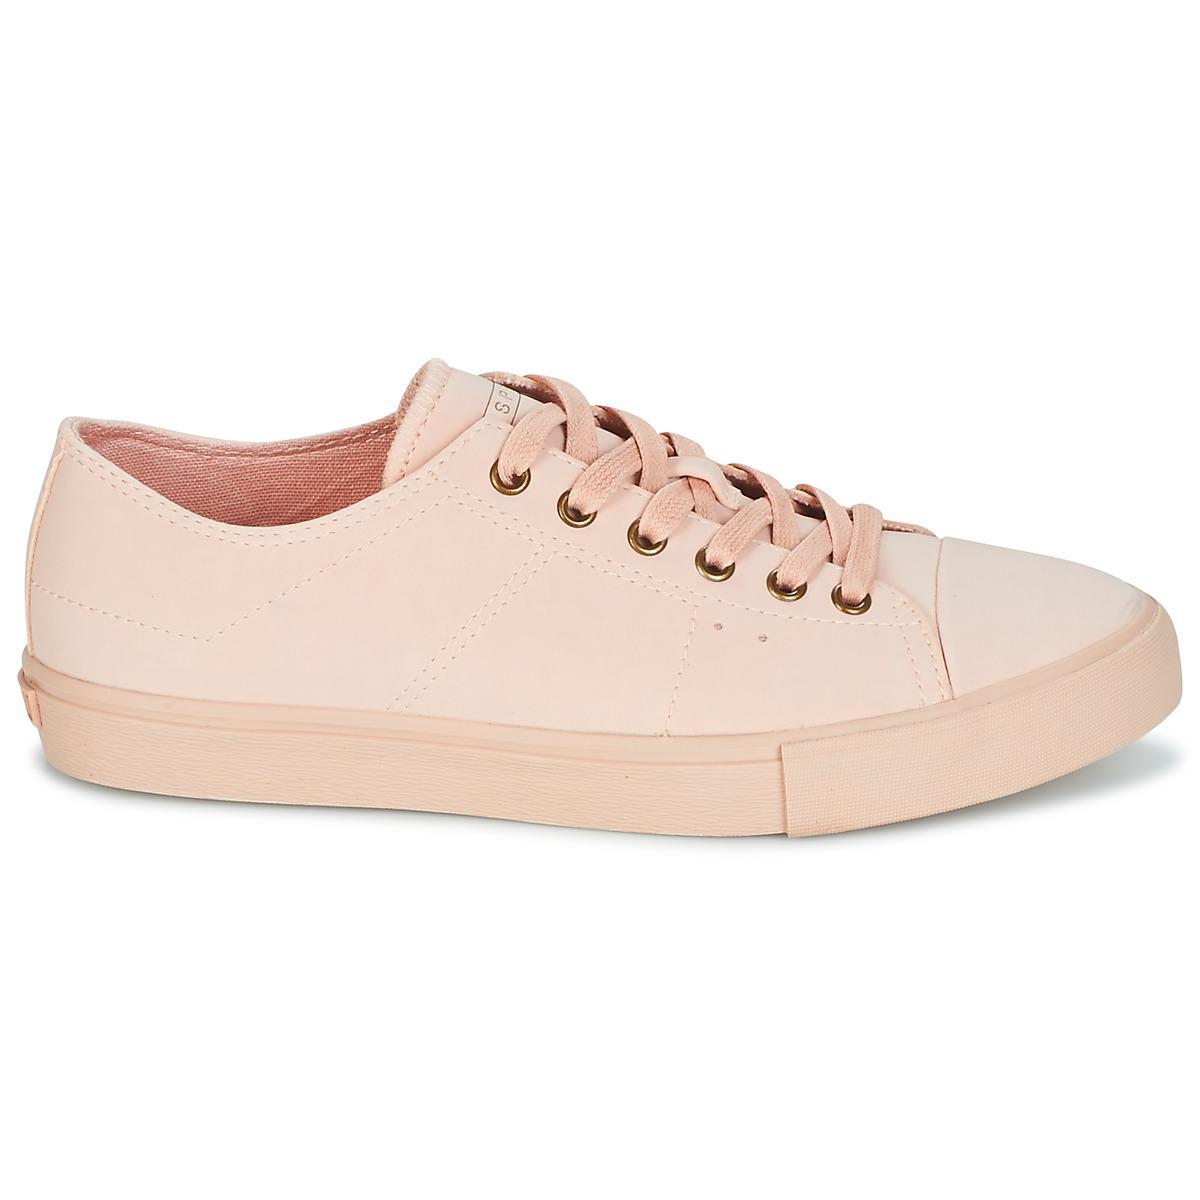 Lyst Up Lace 0vqywdb Chaussures Femme En Baskets Rose Sonet Esprit wrHqrYxt4